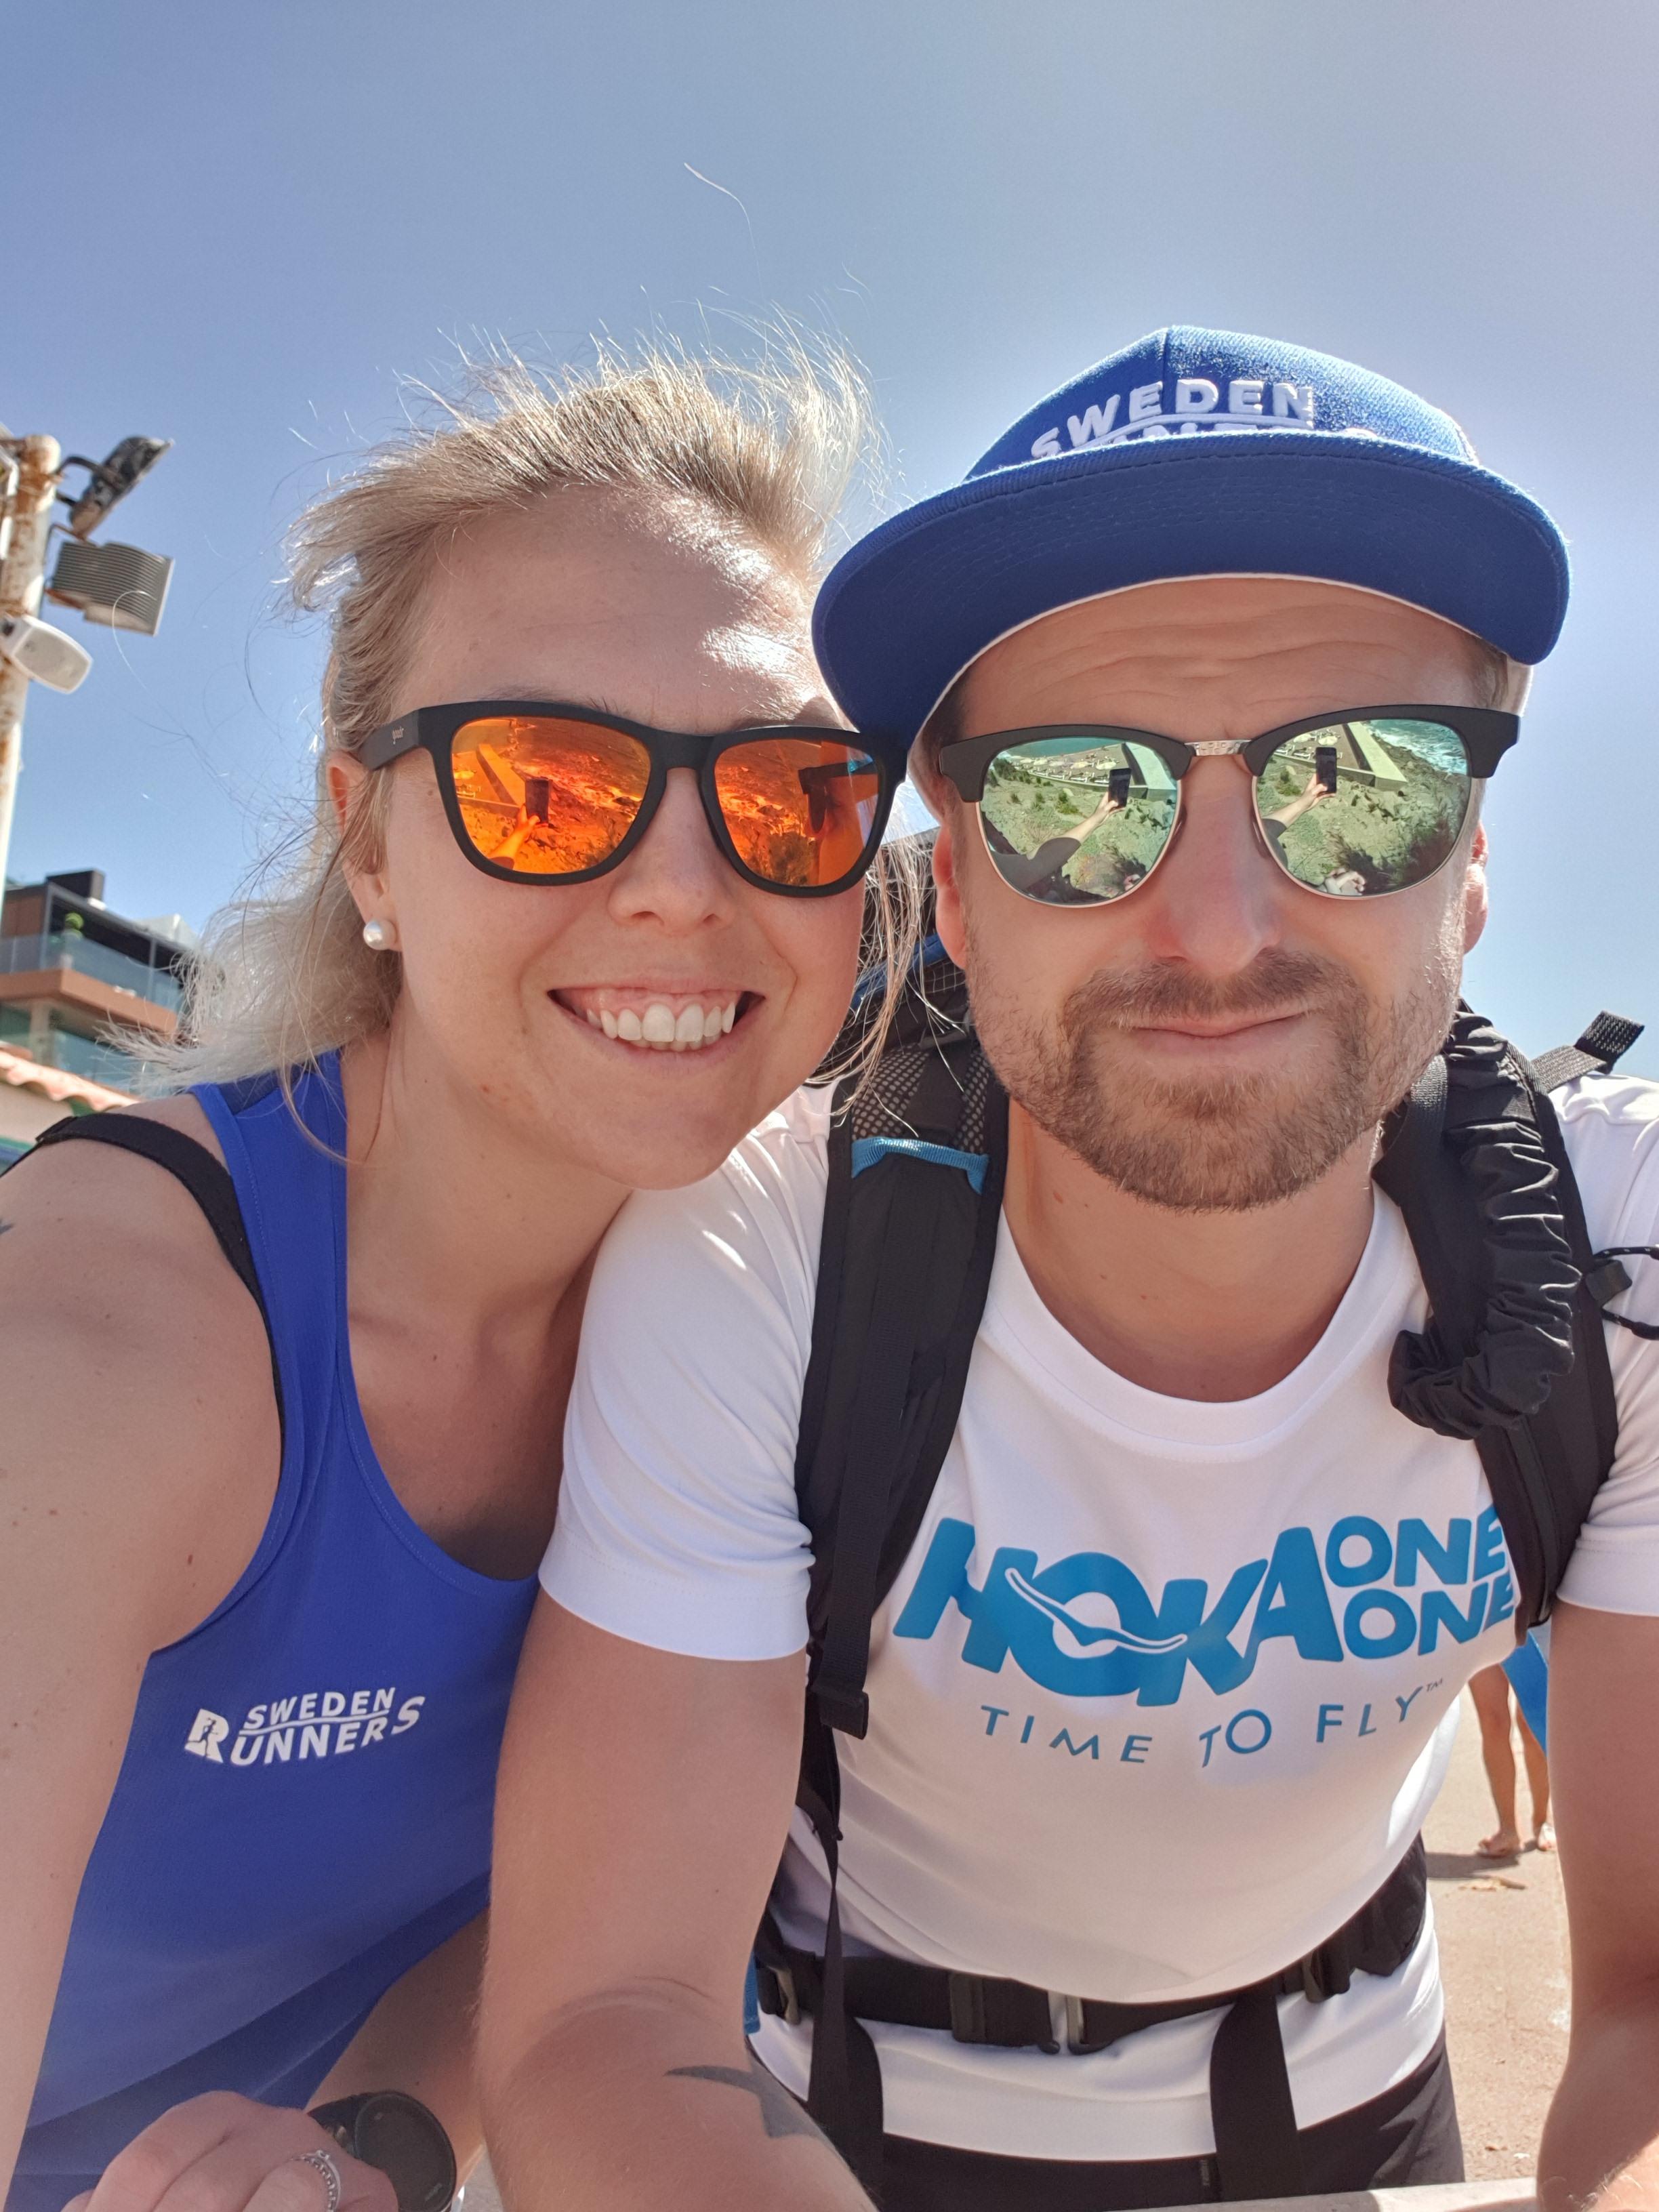 Marcus och Petra Ekenstierna, Sweden Runners